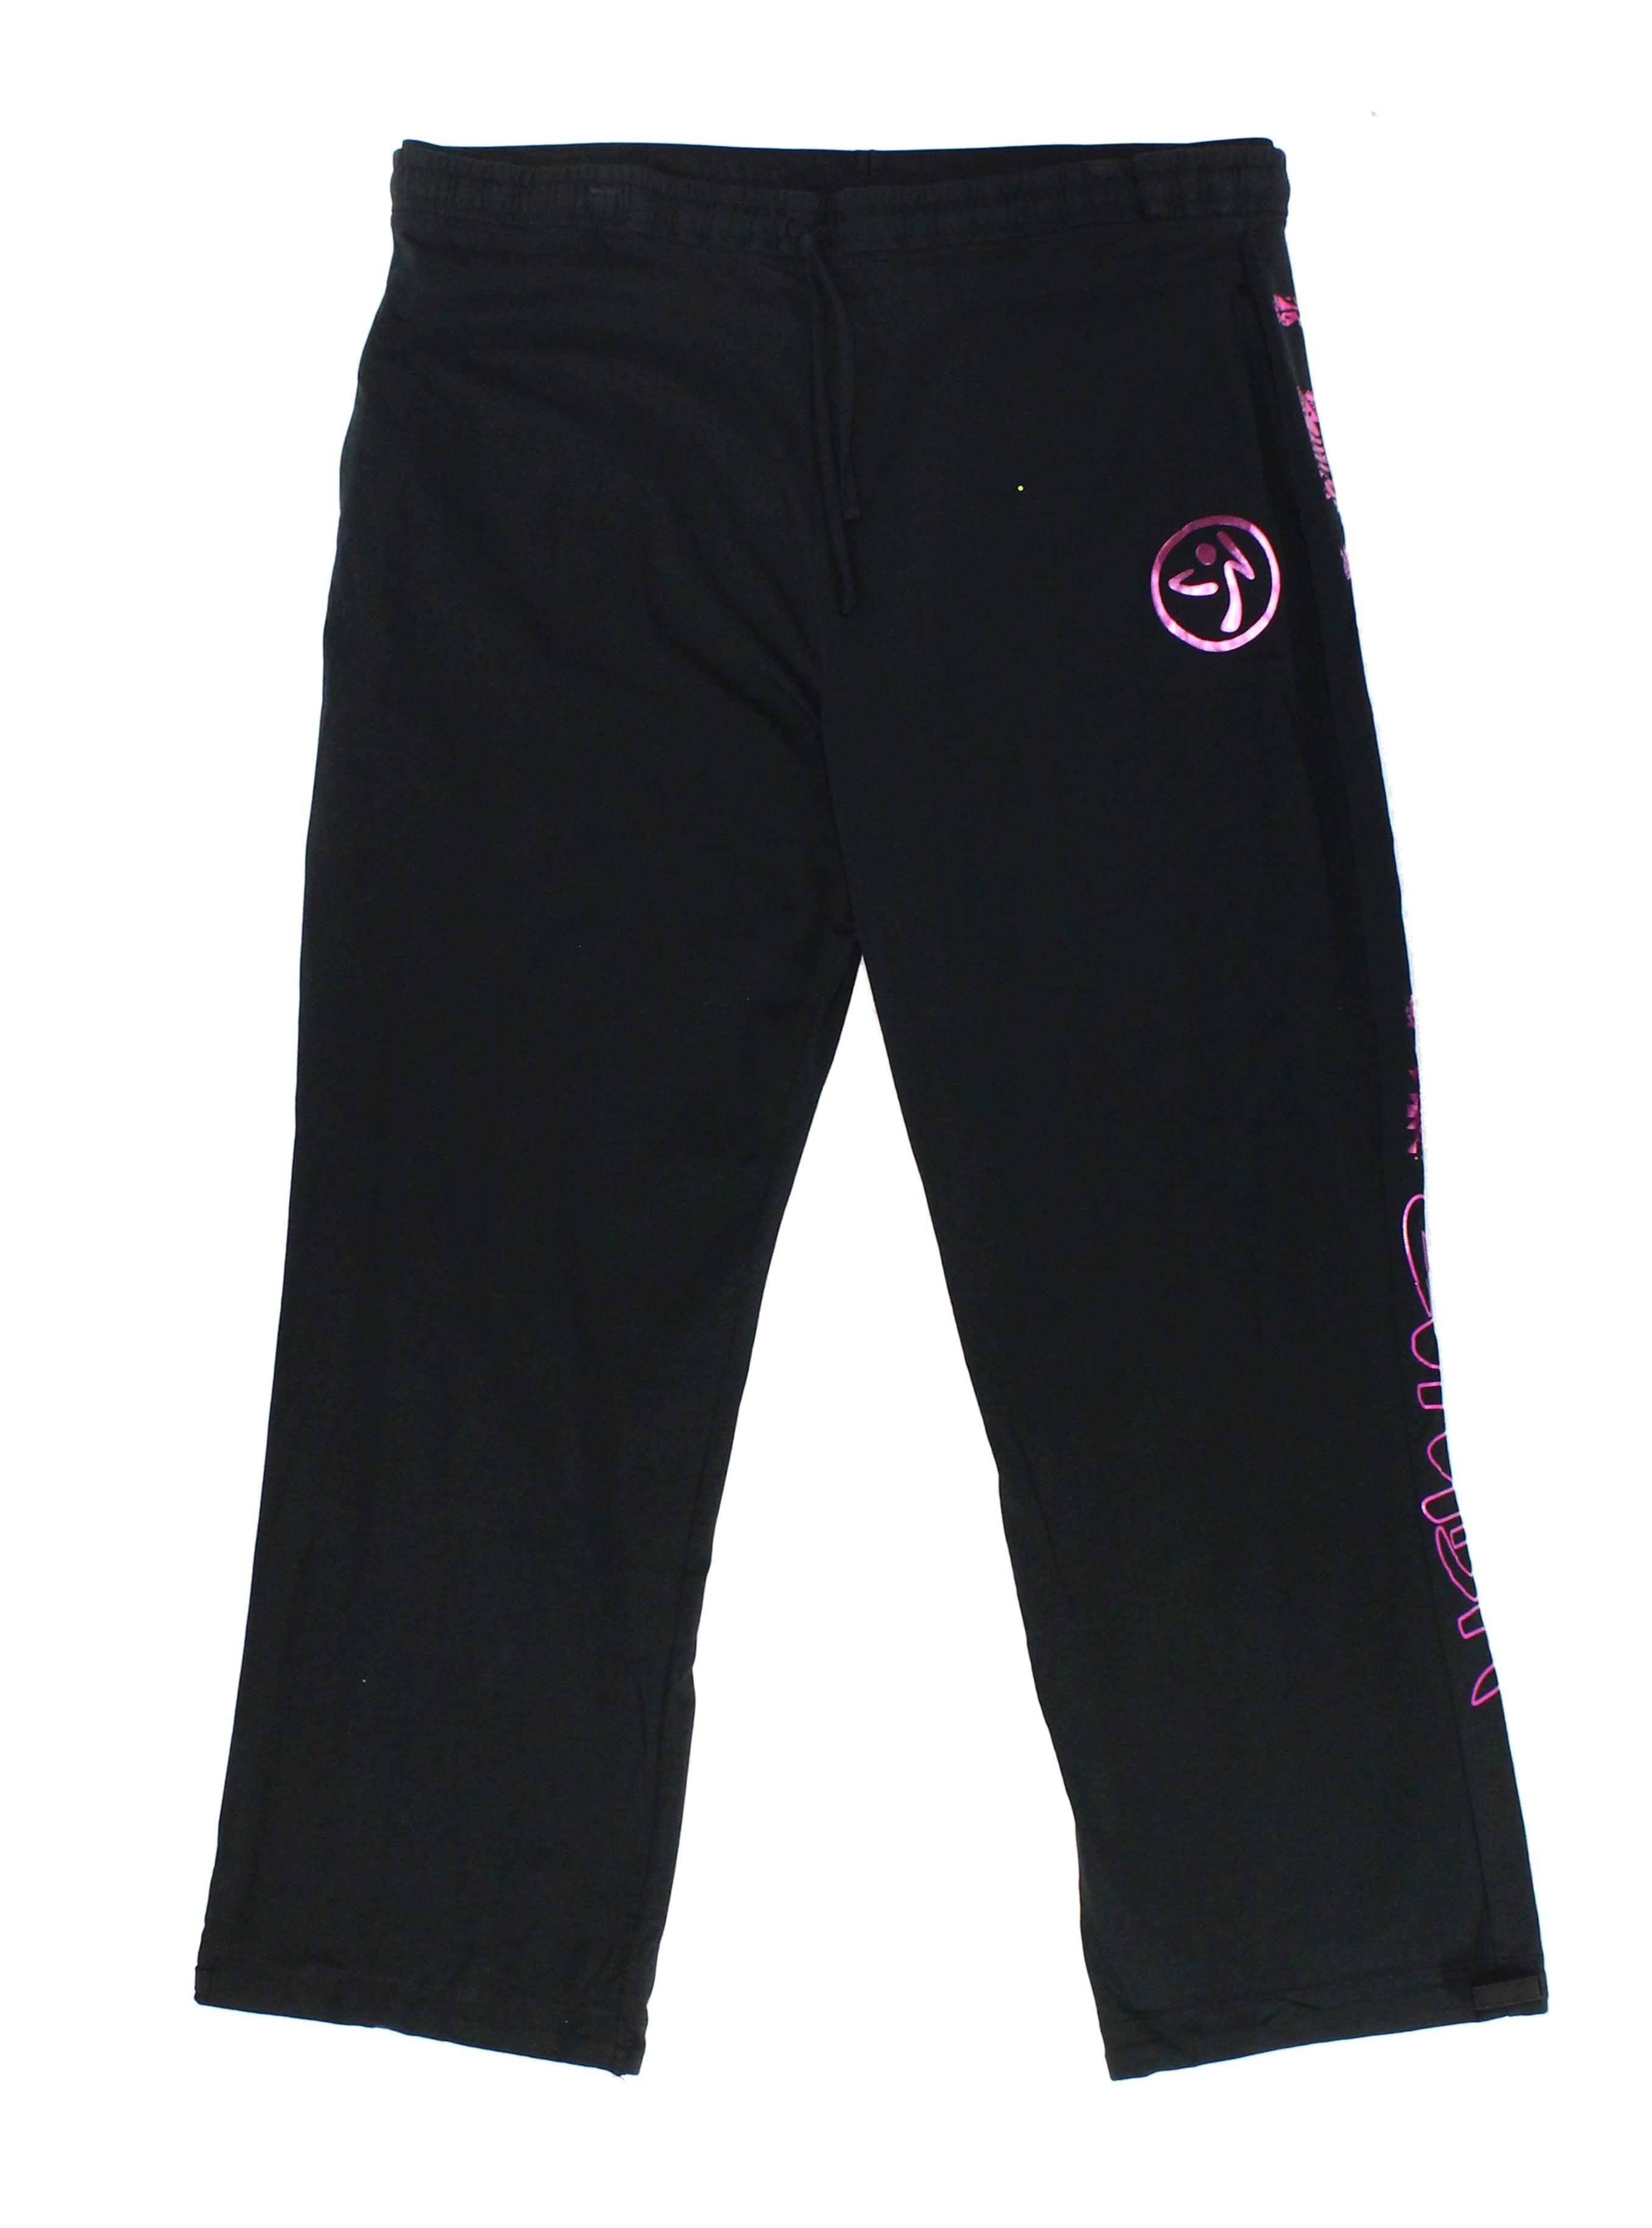 Zumba New Deep Black Womens Size 2XL Stretch Drawstring Printed Pants by Zumba